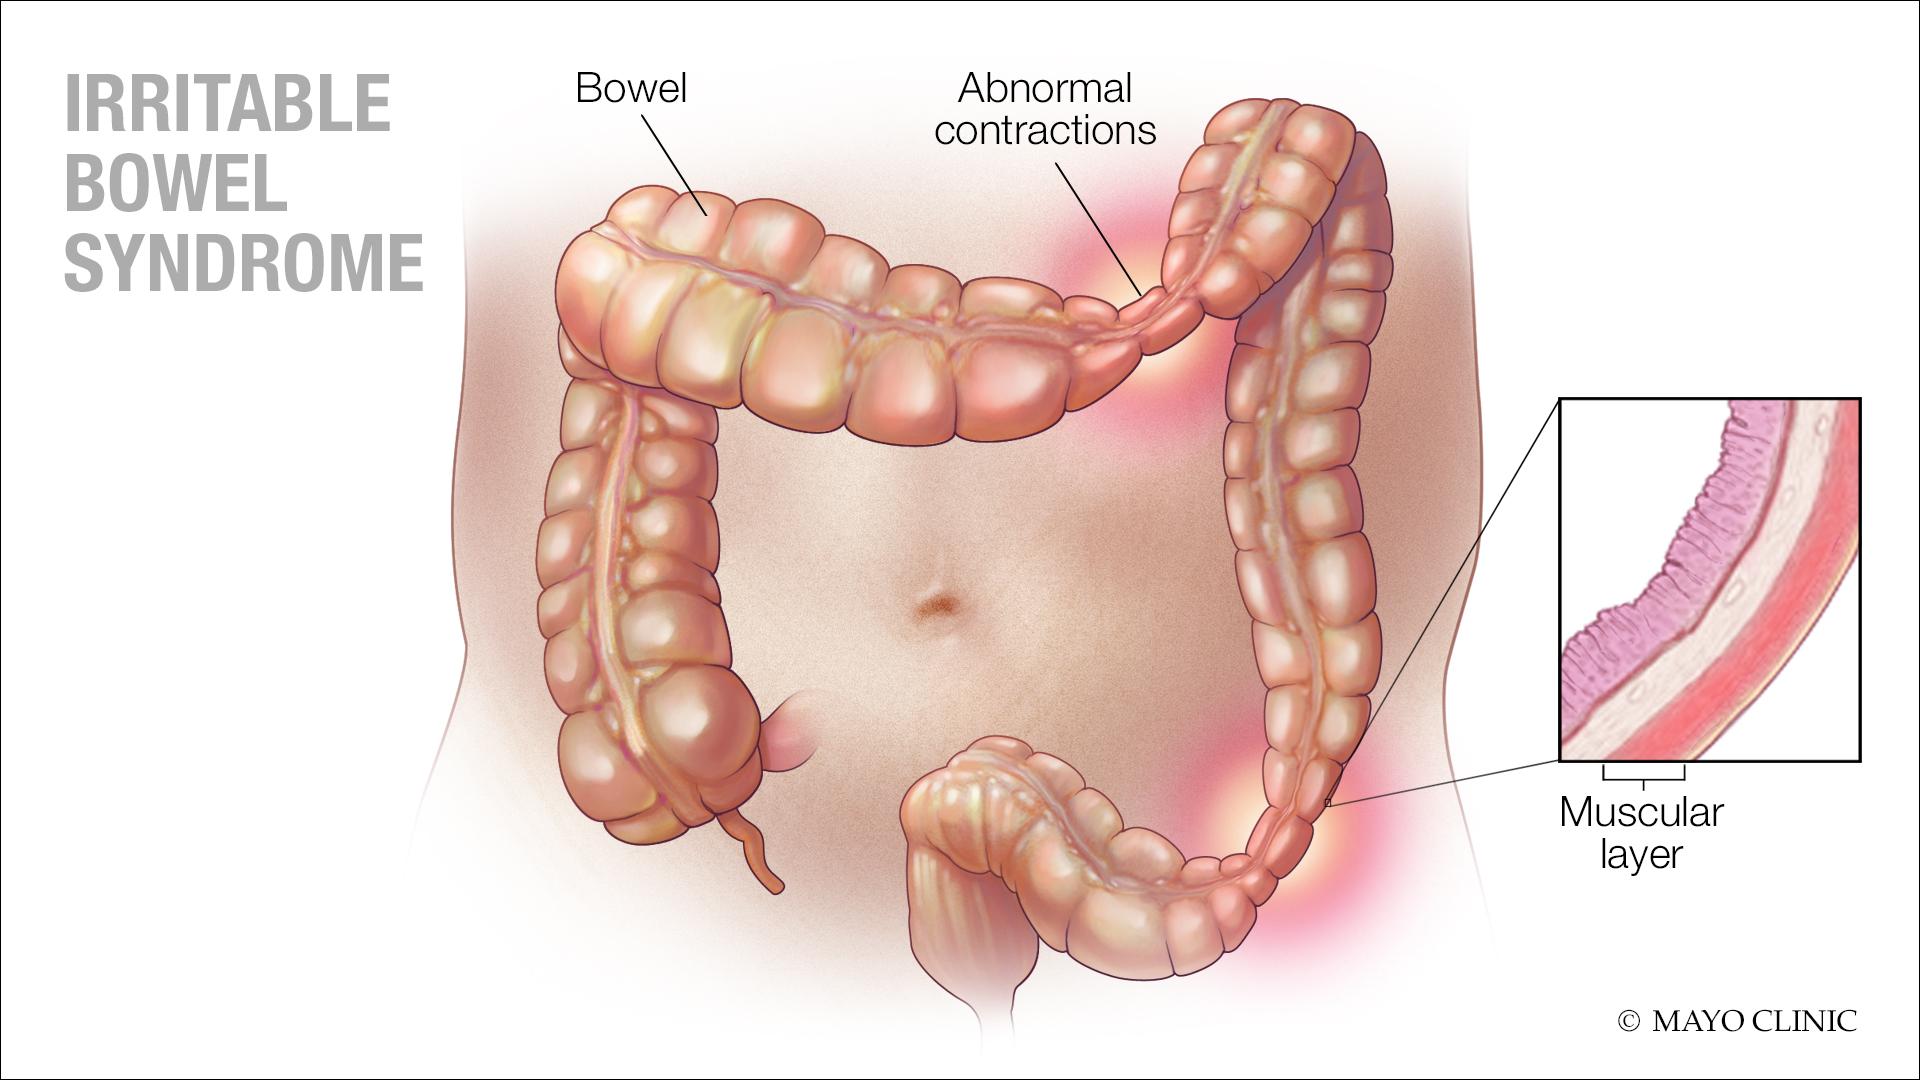 Medical illustration of irritable bowel syndrome (IBS)